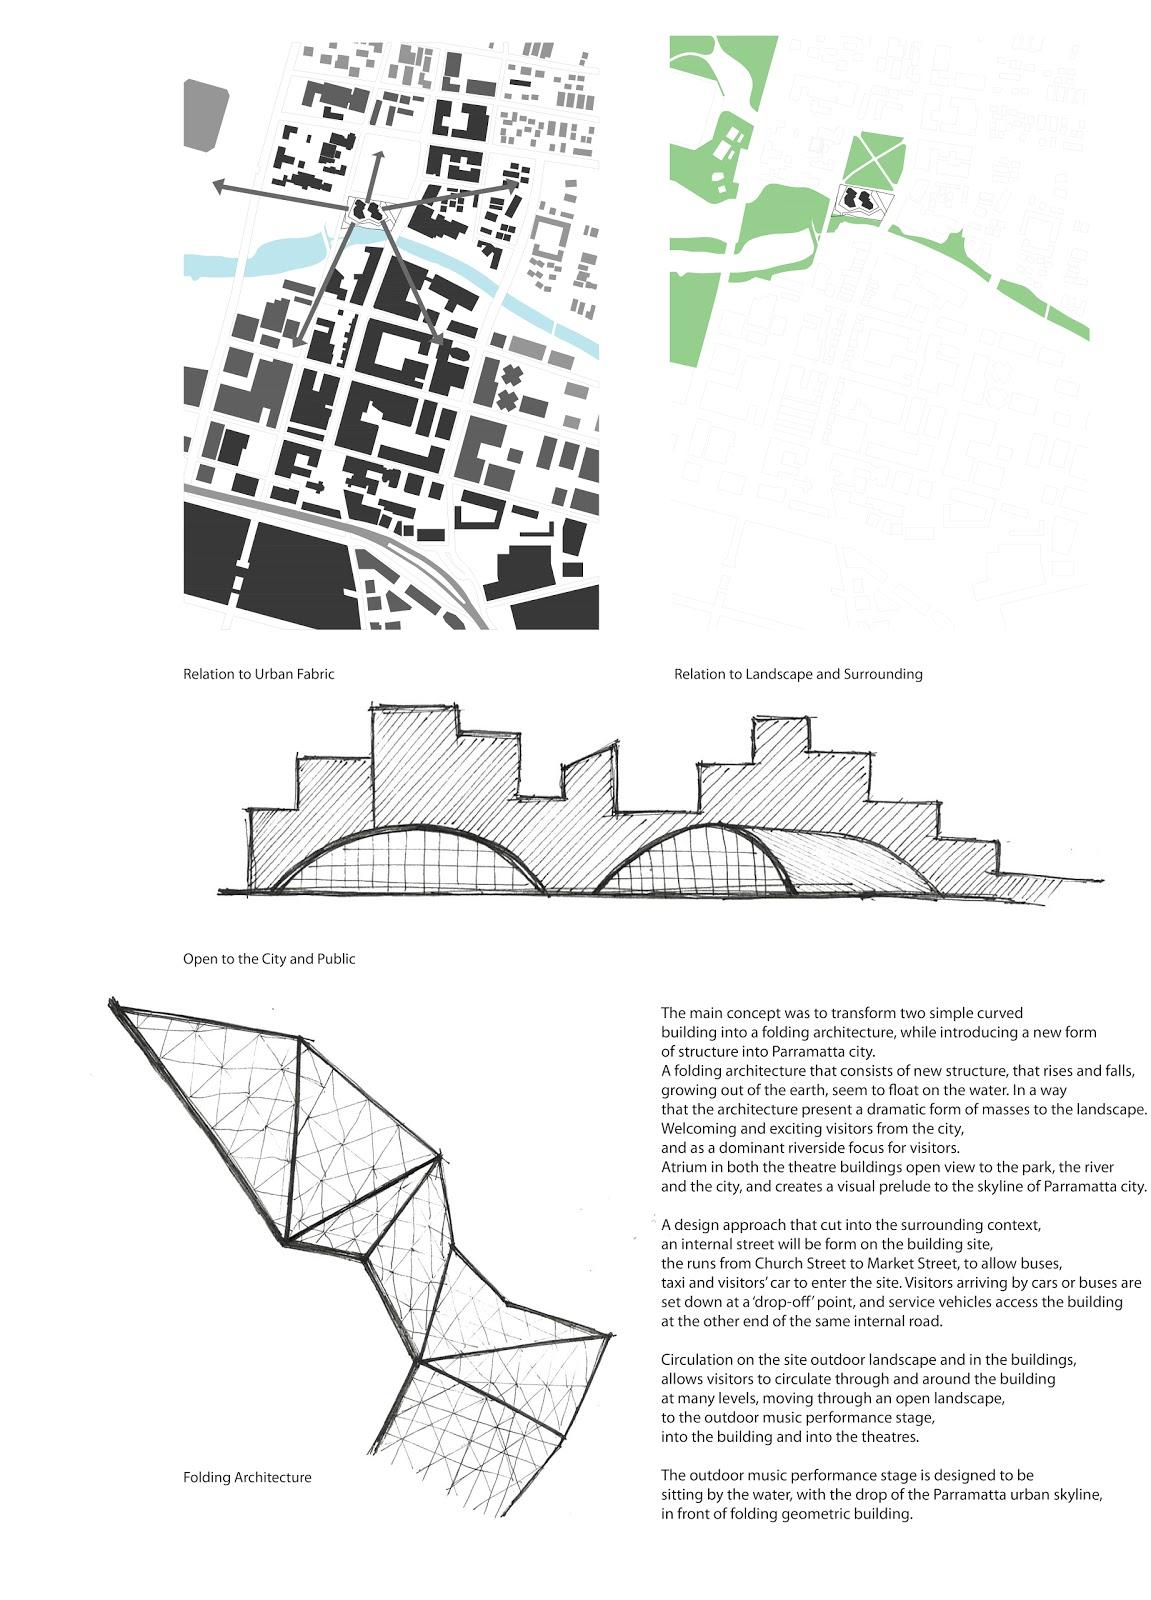 Basic Concept Of The Design Scheme 1 Folding Architecture